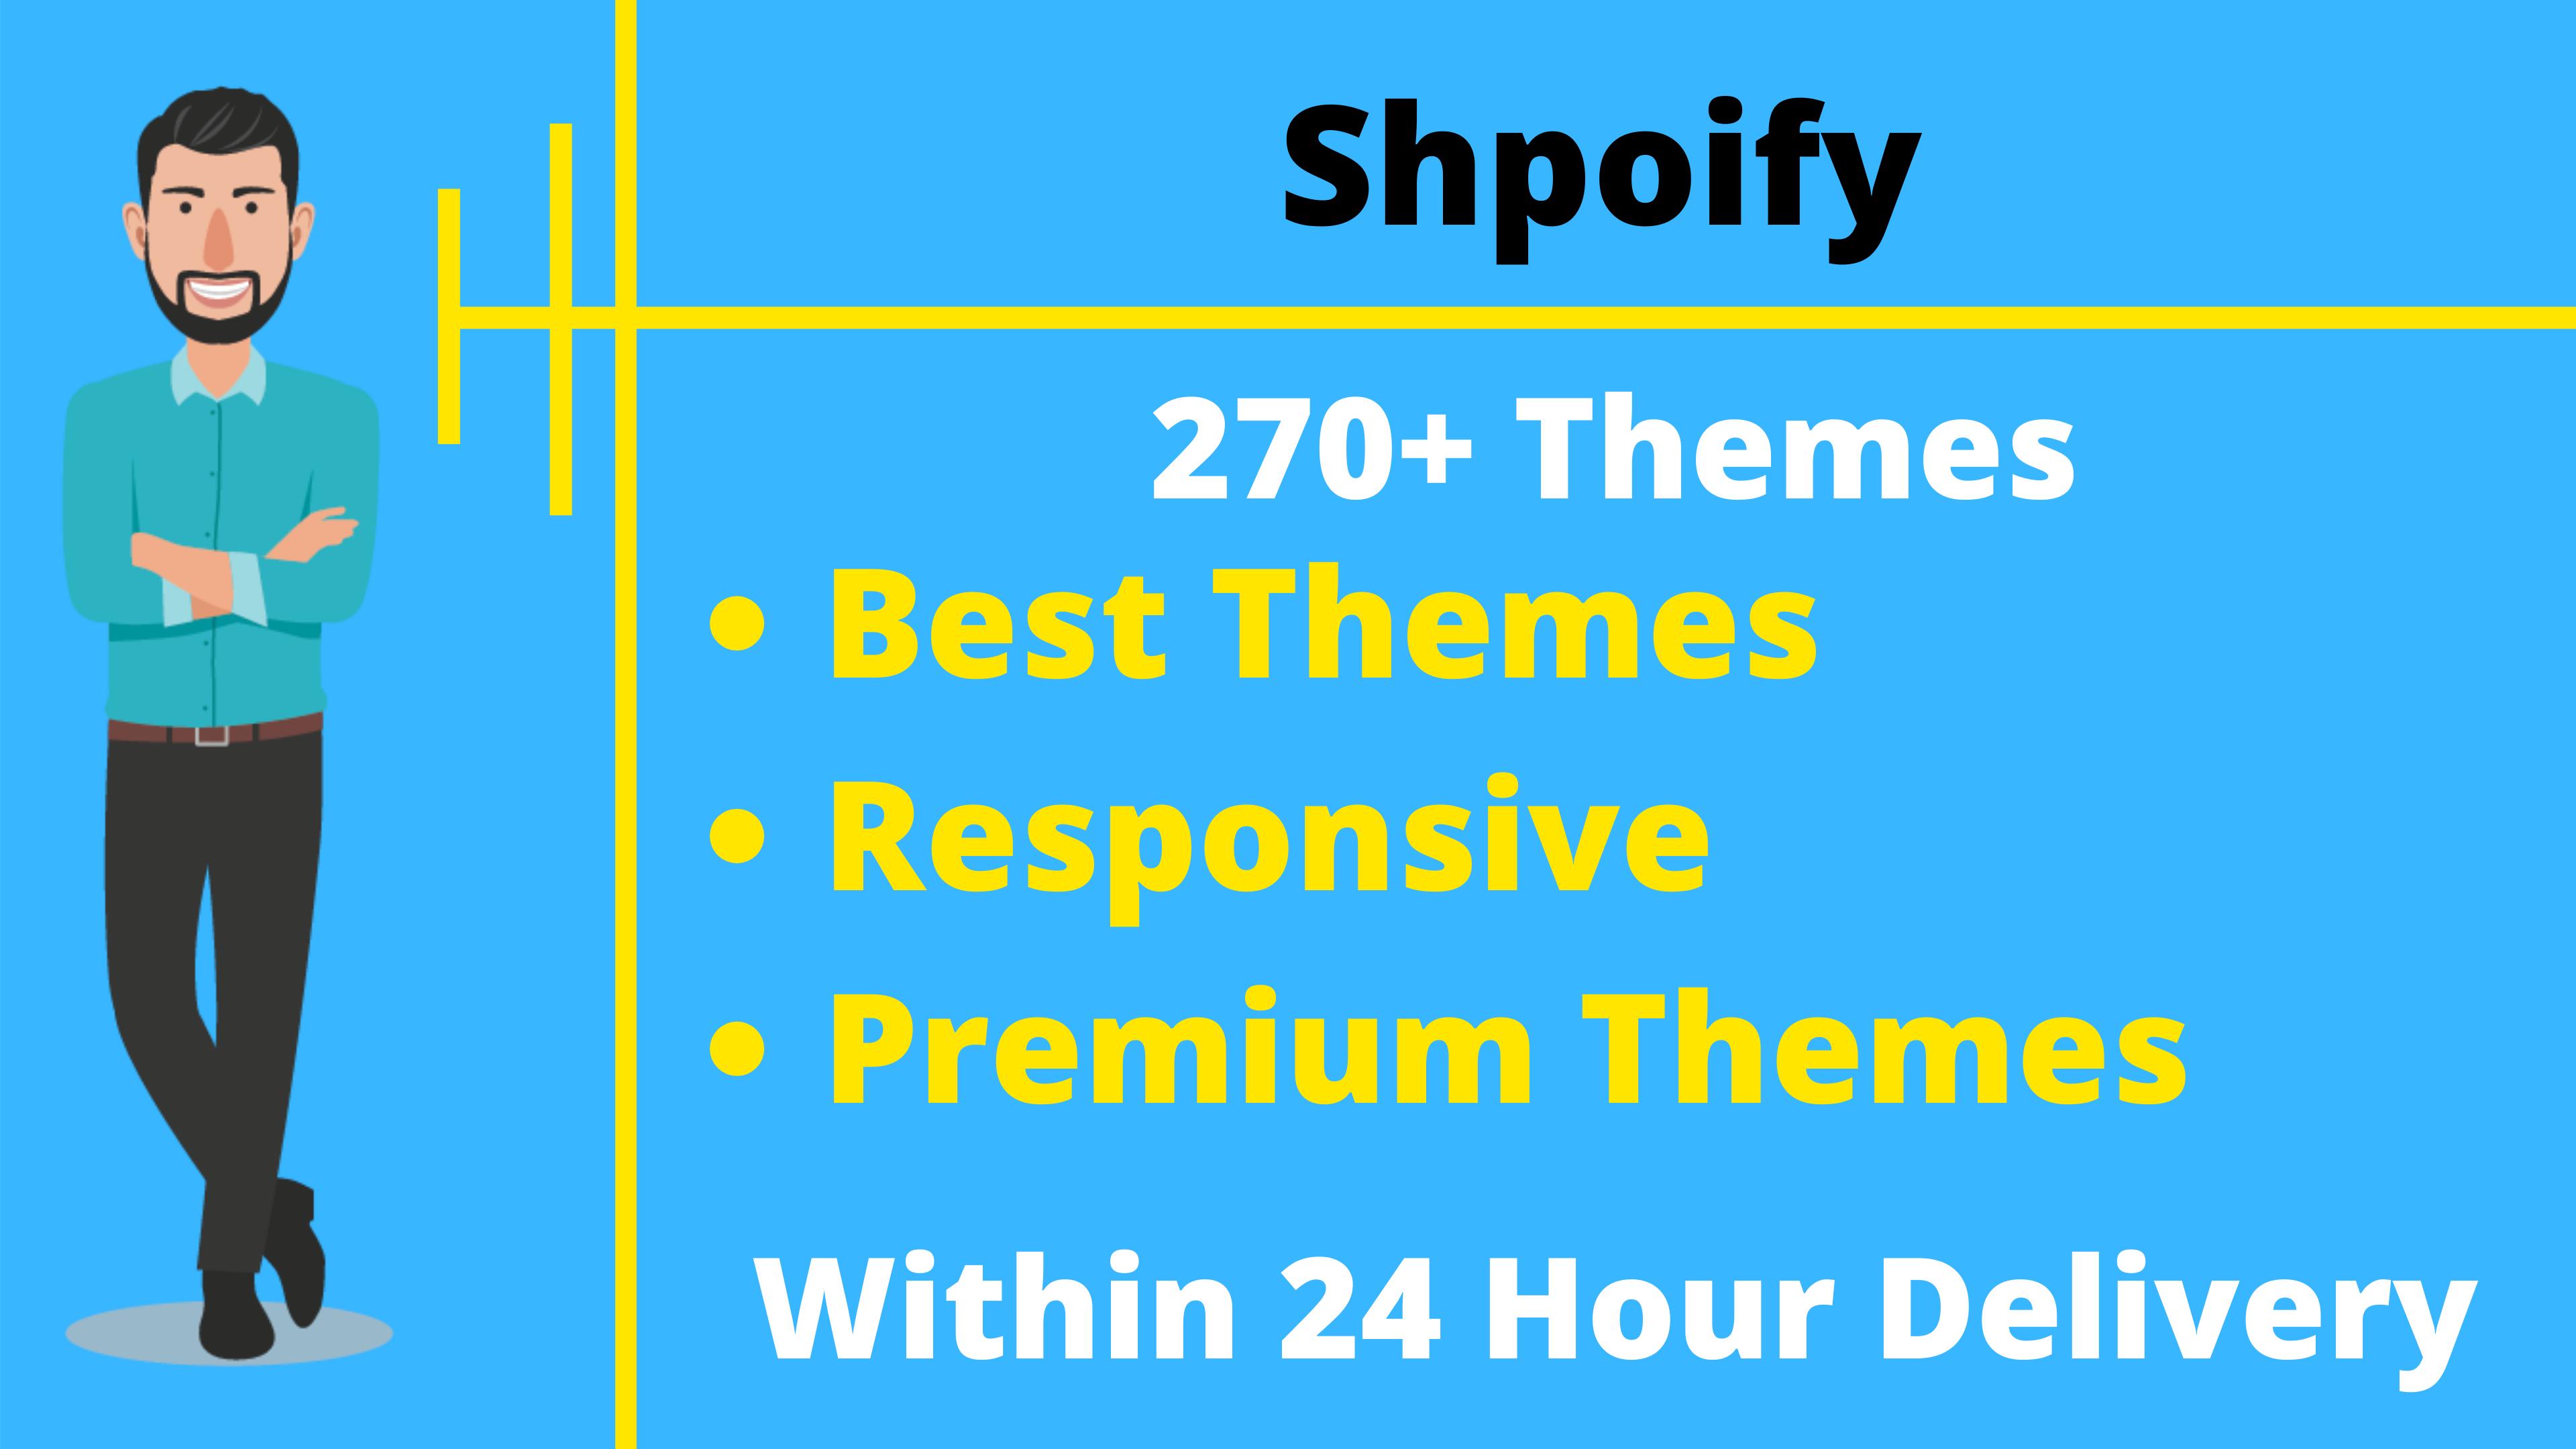 250+ Premium Shopify Store Themes & Templates